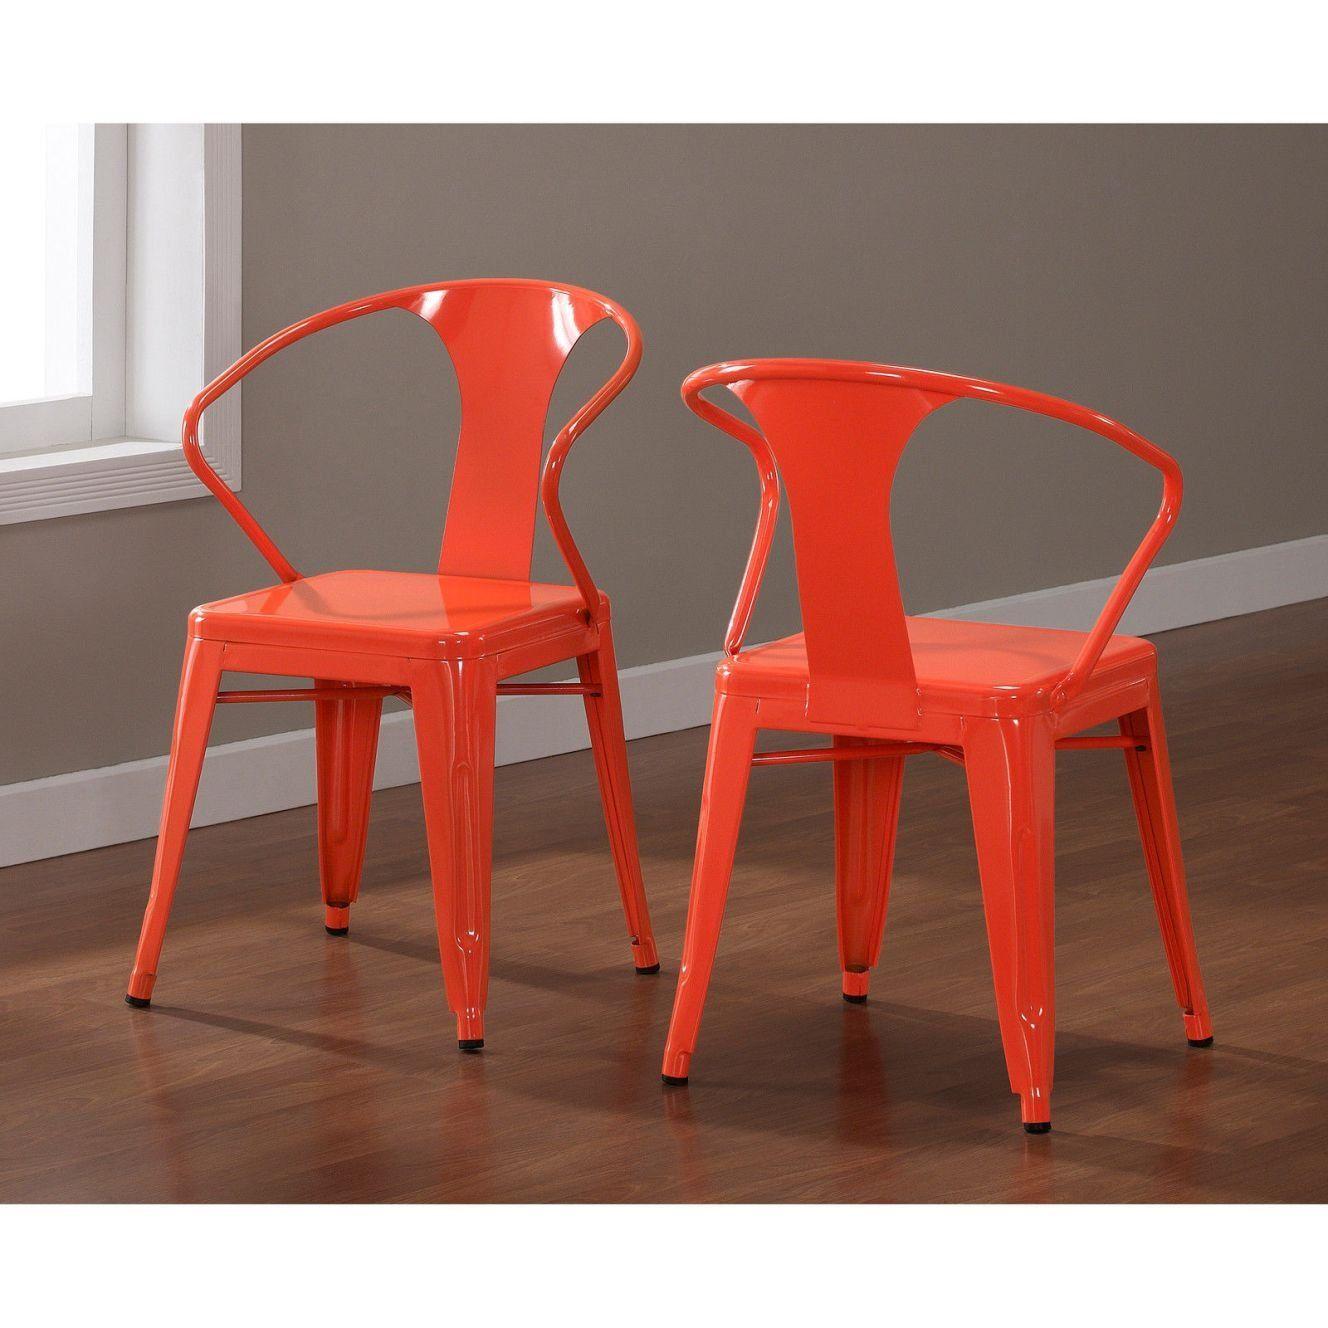 amazon kitchen chairs Amazon com Set of 4 Orange Metal Chairs in Glossy Powder Coated Finish Steel